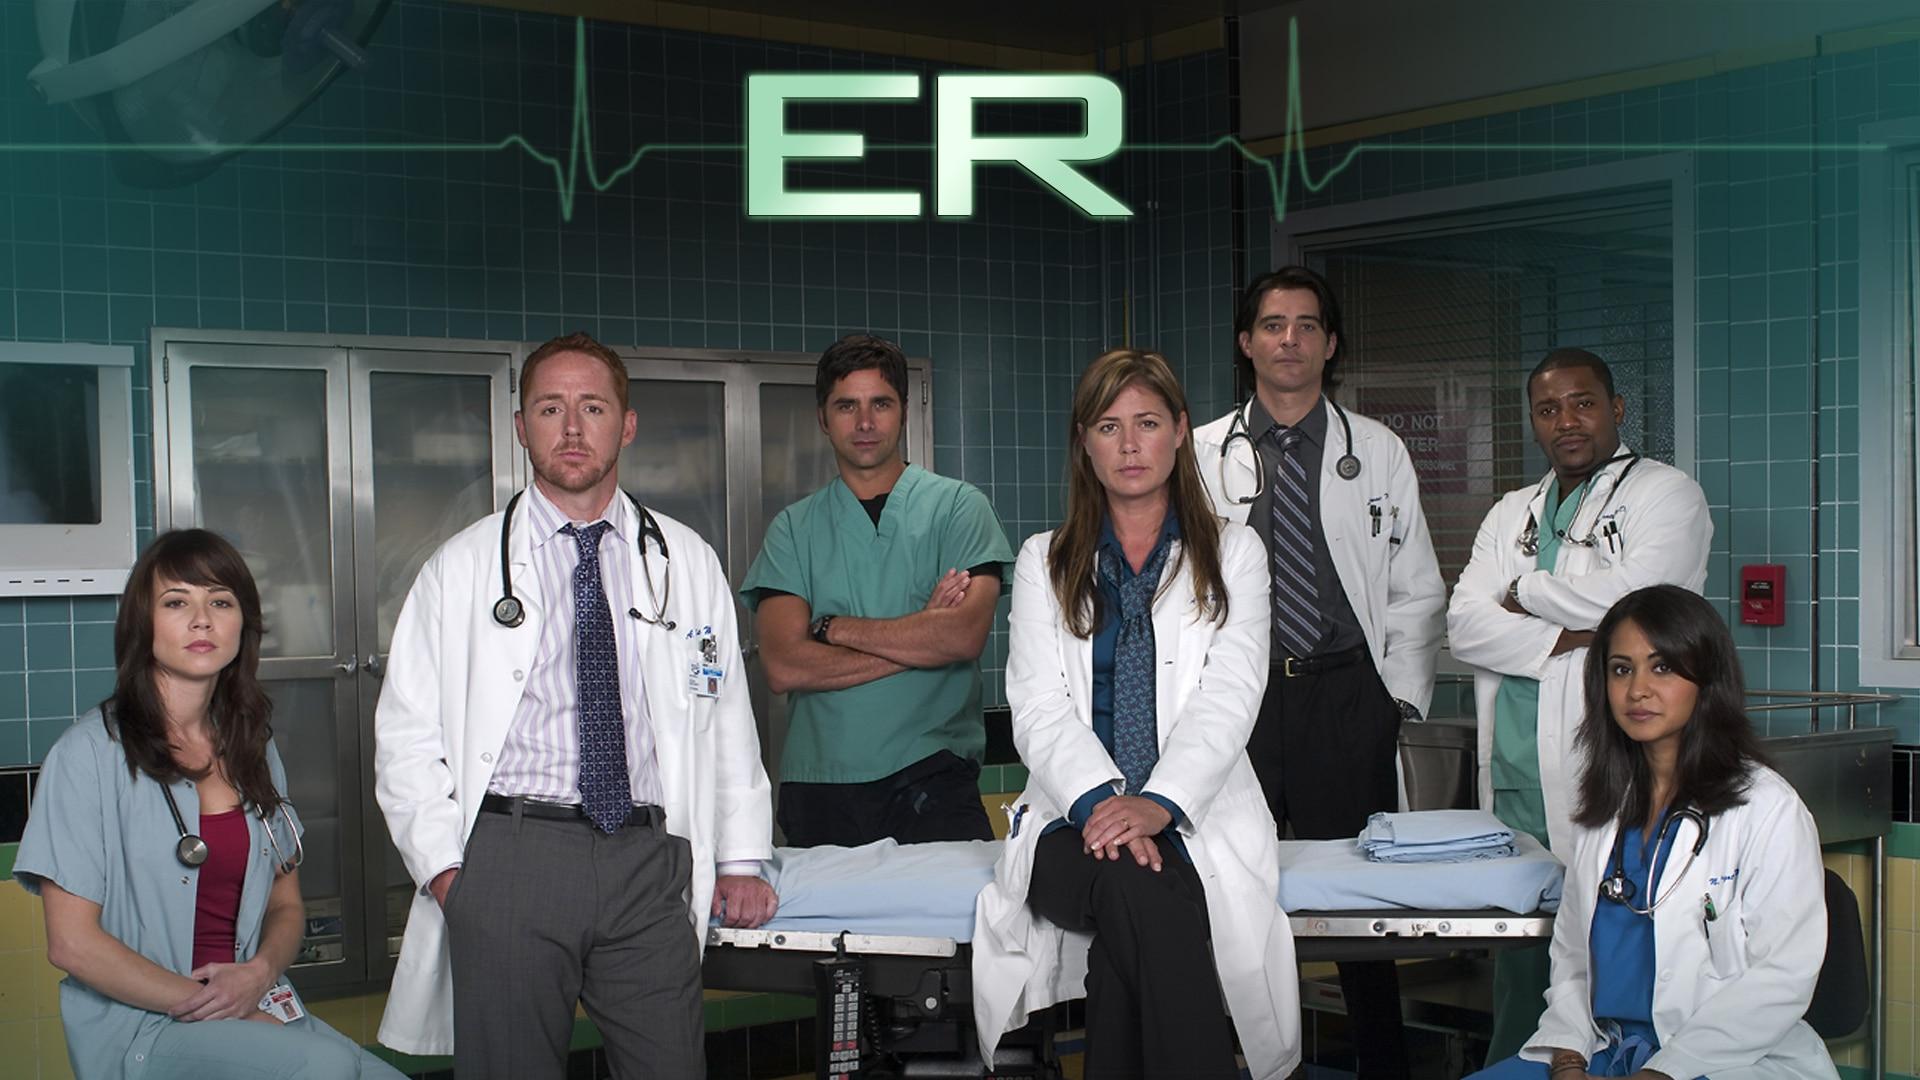 watch er season 1 online free